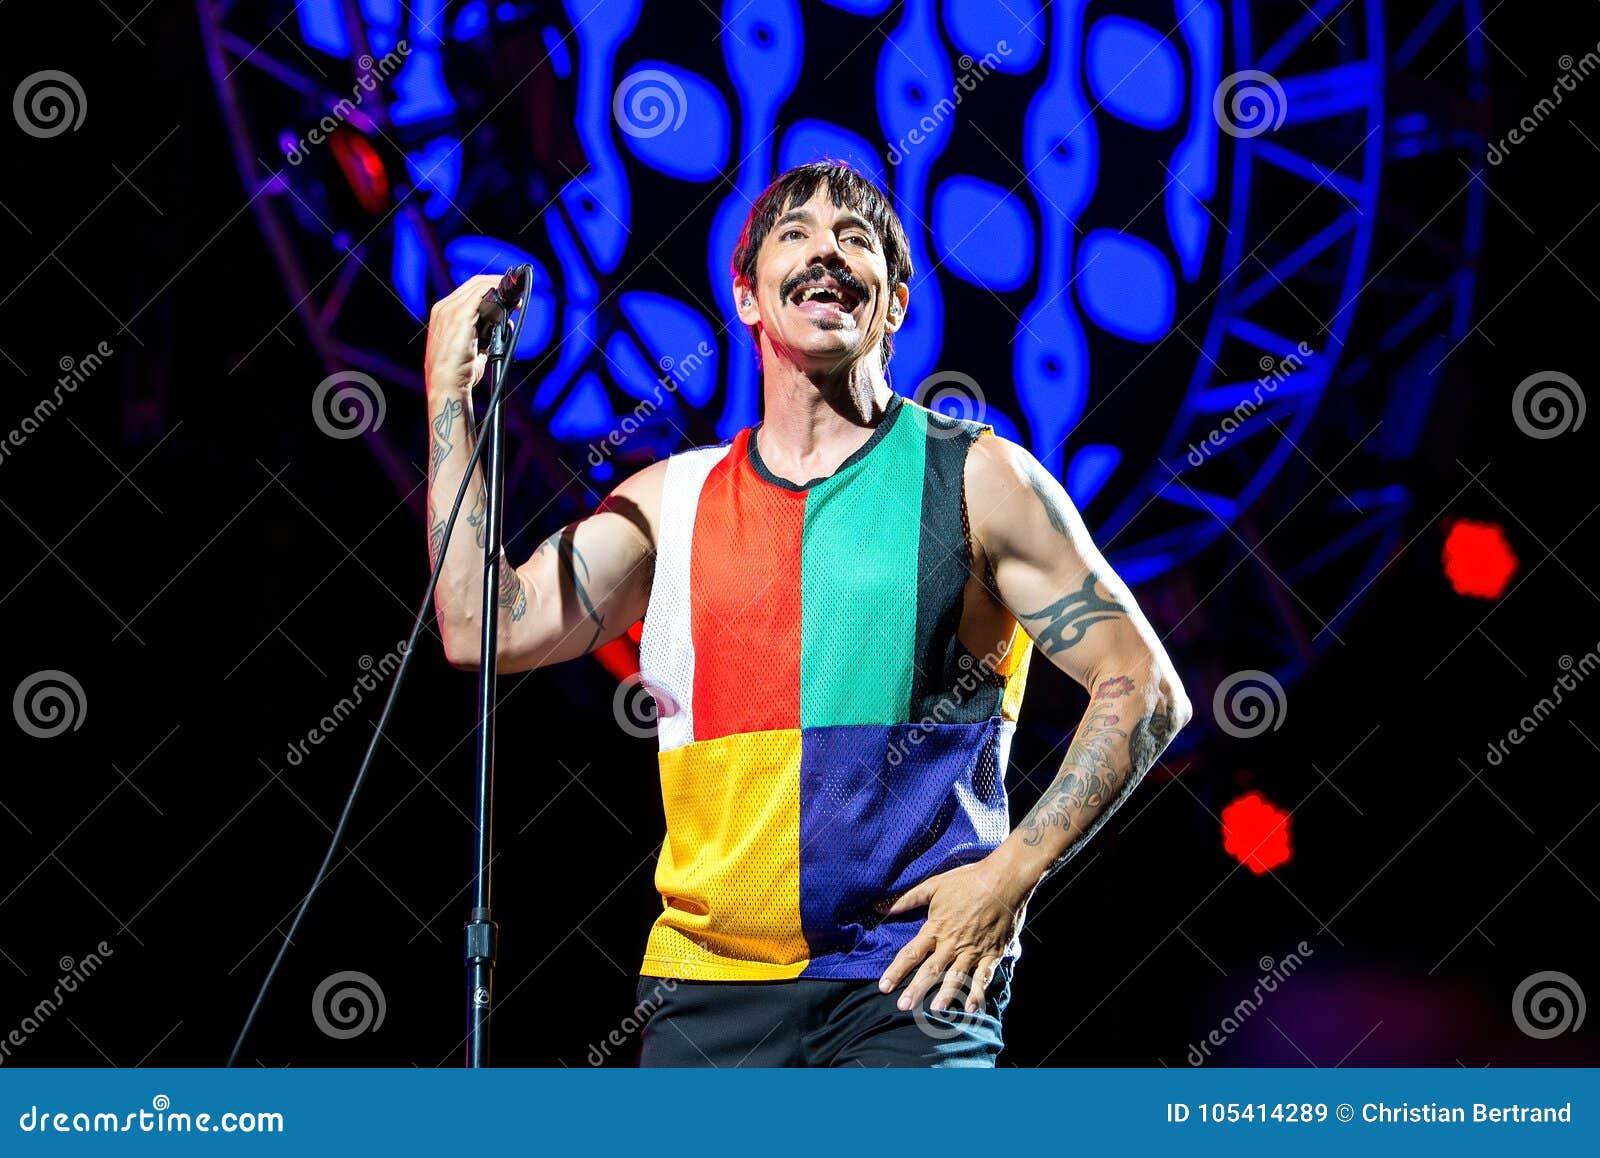 Anthony Kiedis, frontman van Roodgloeiende Chili Peppers-muziekband, presteert in overleg bij FIB Festival